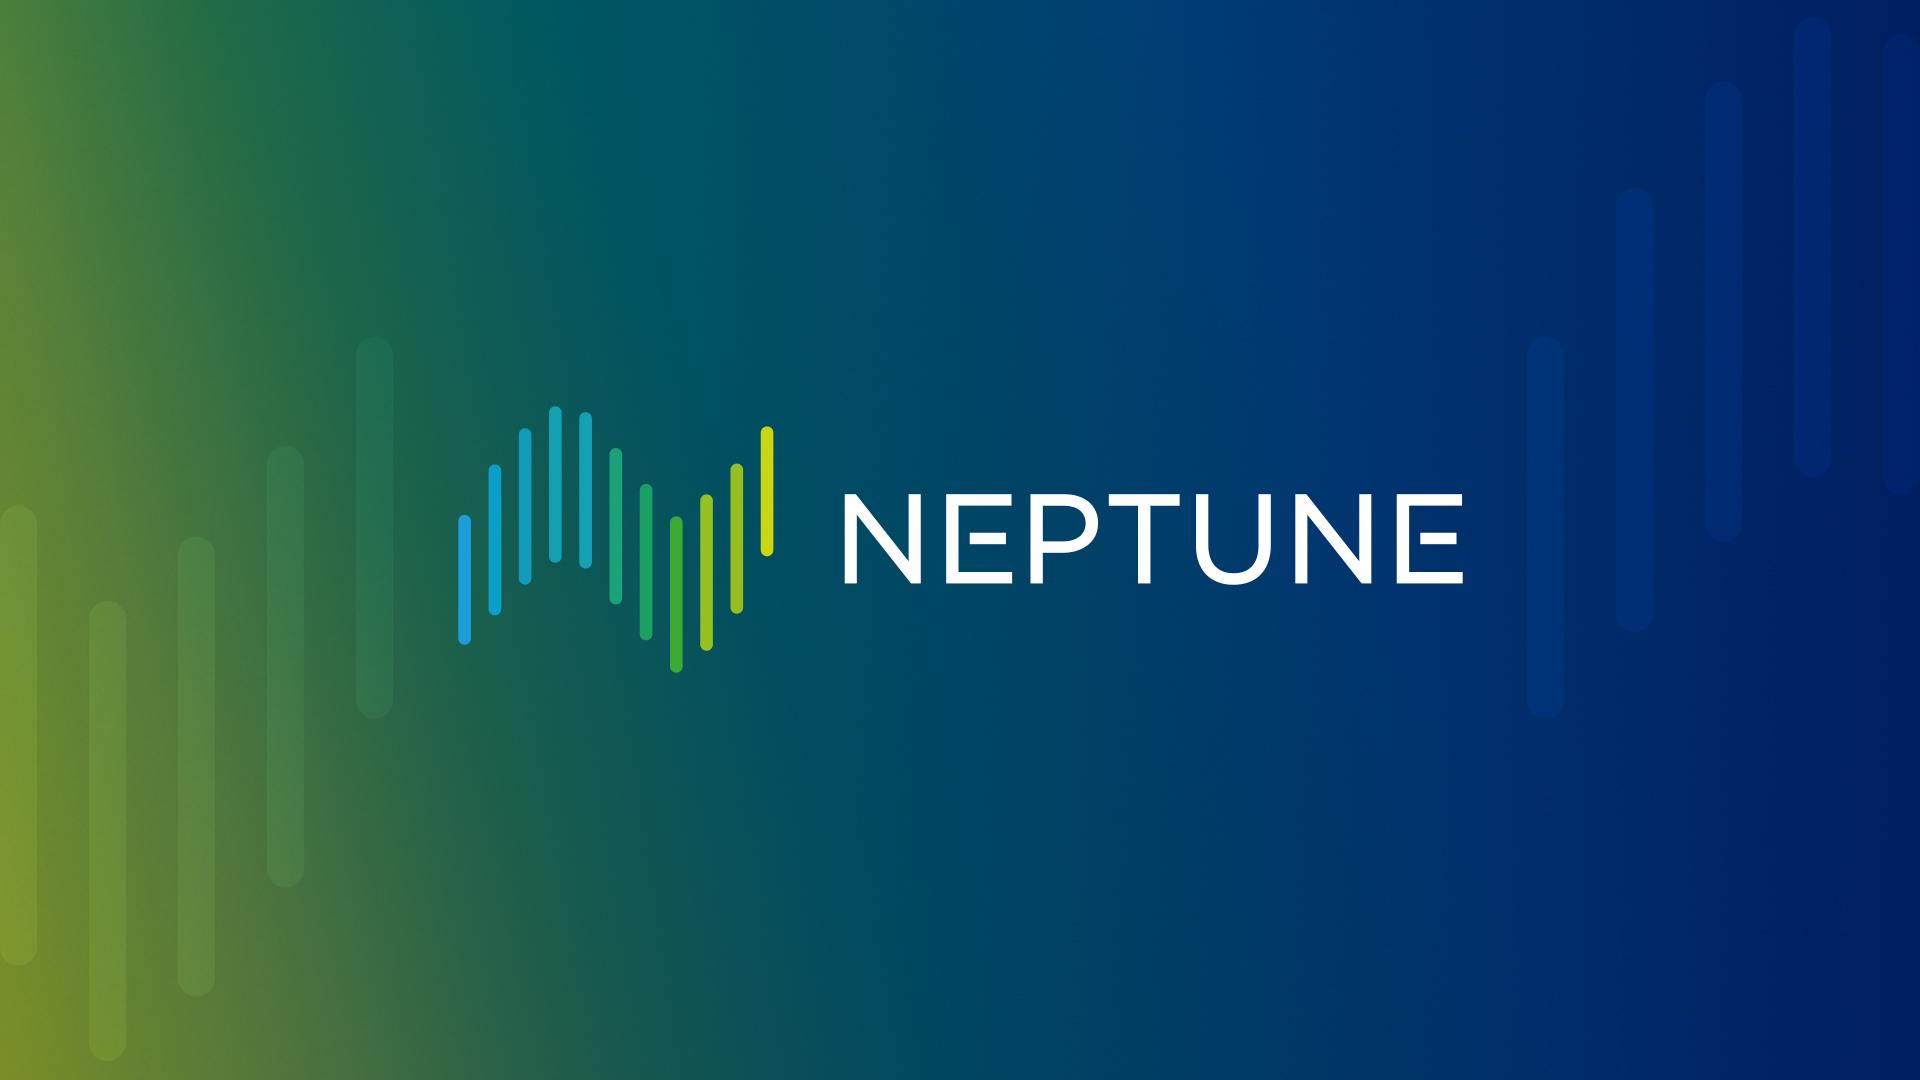 WOE6070_Neptune-Banner_1920x1080_72dpi_AW